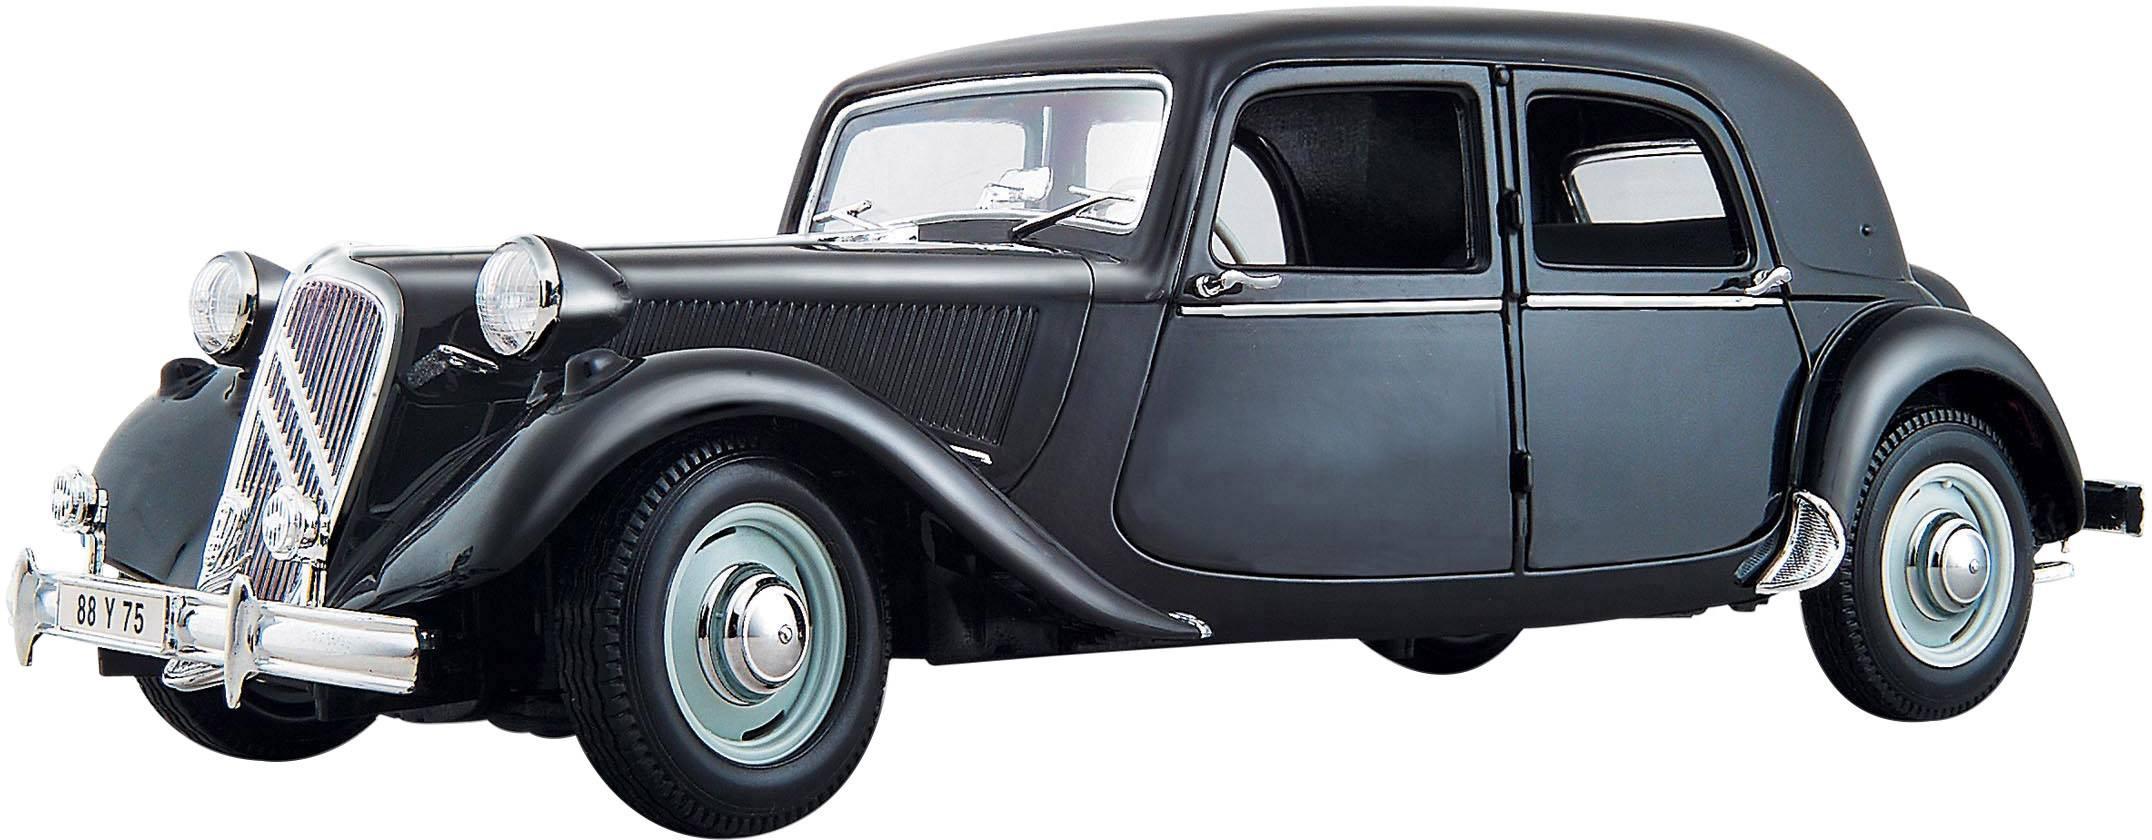 ситроен 15 cv1952 год